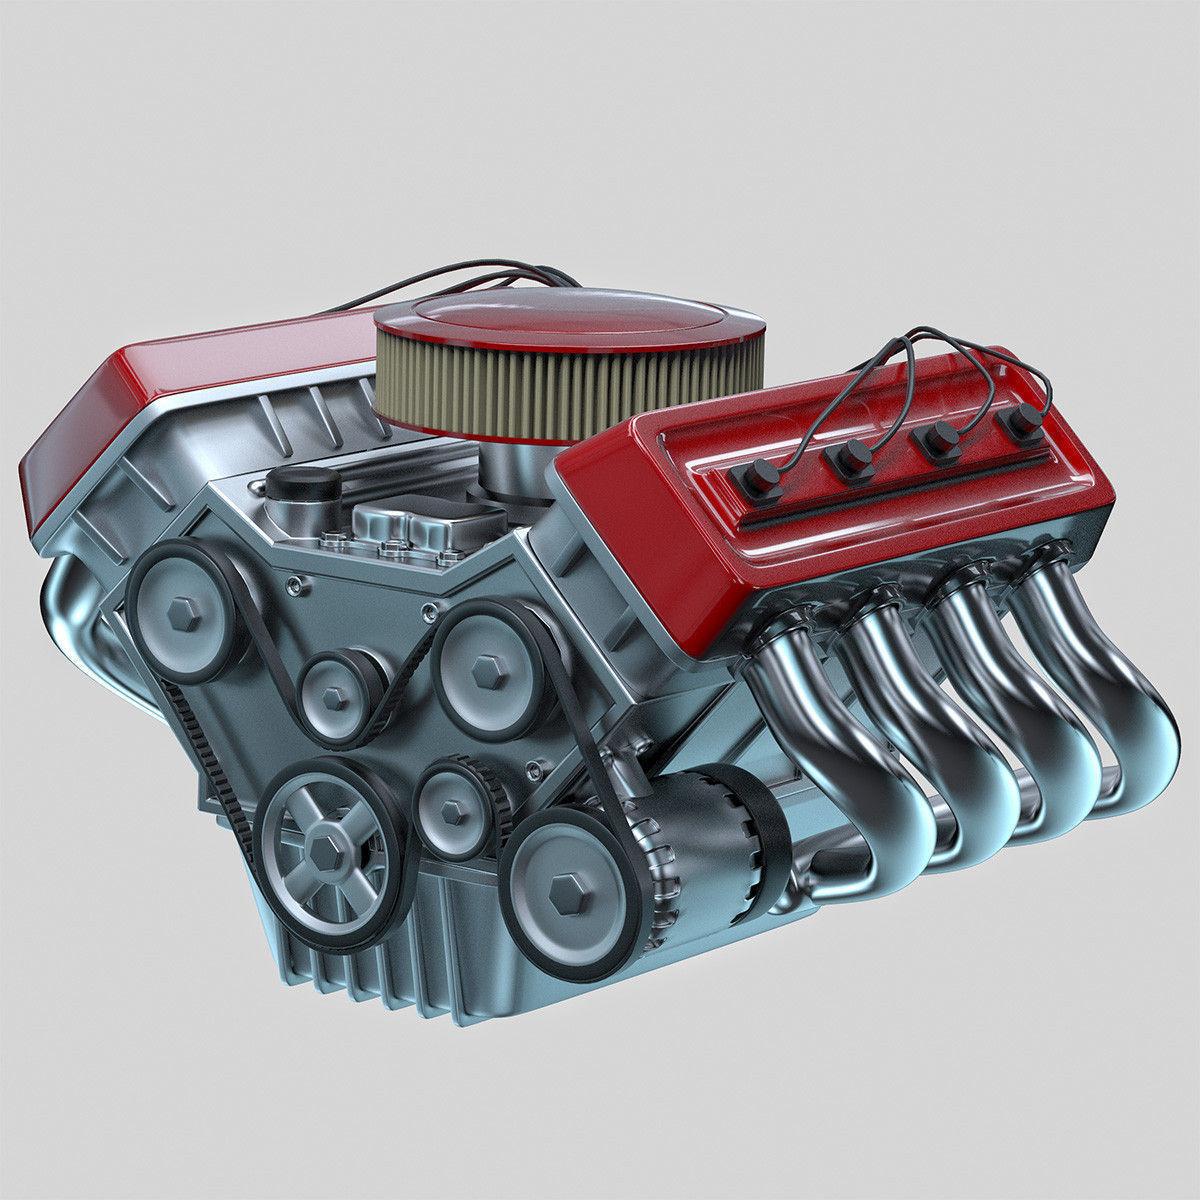 Car engine Animated | 3D model